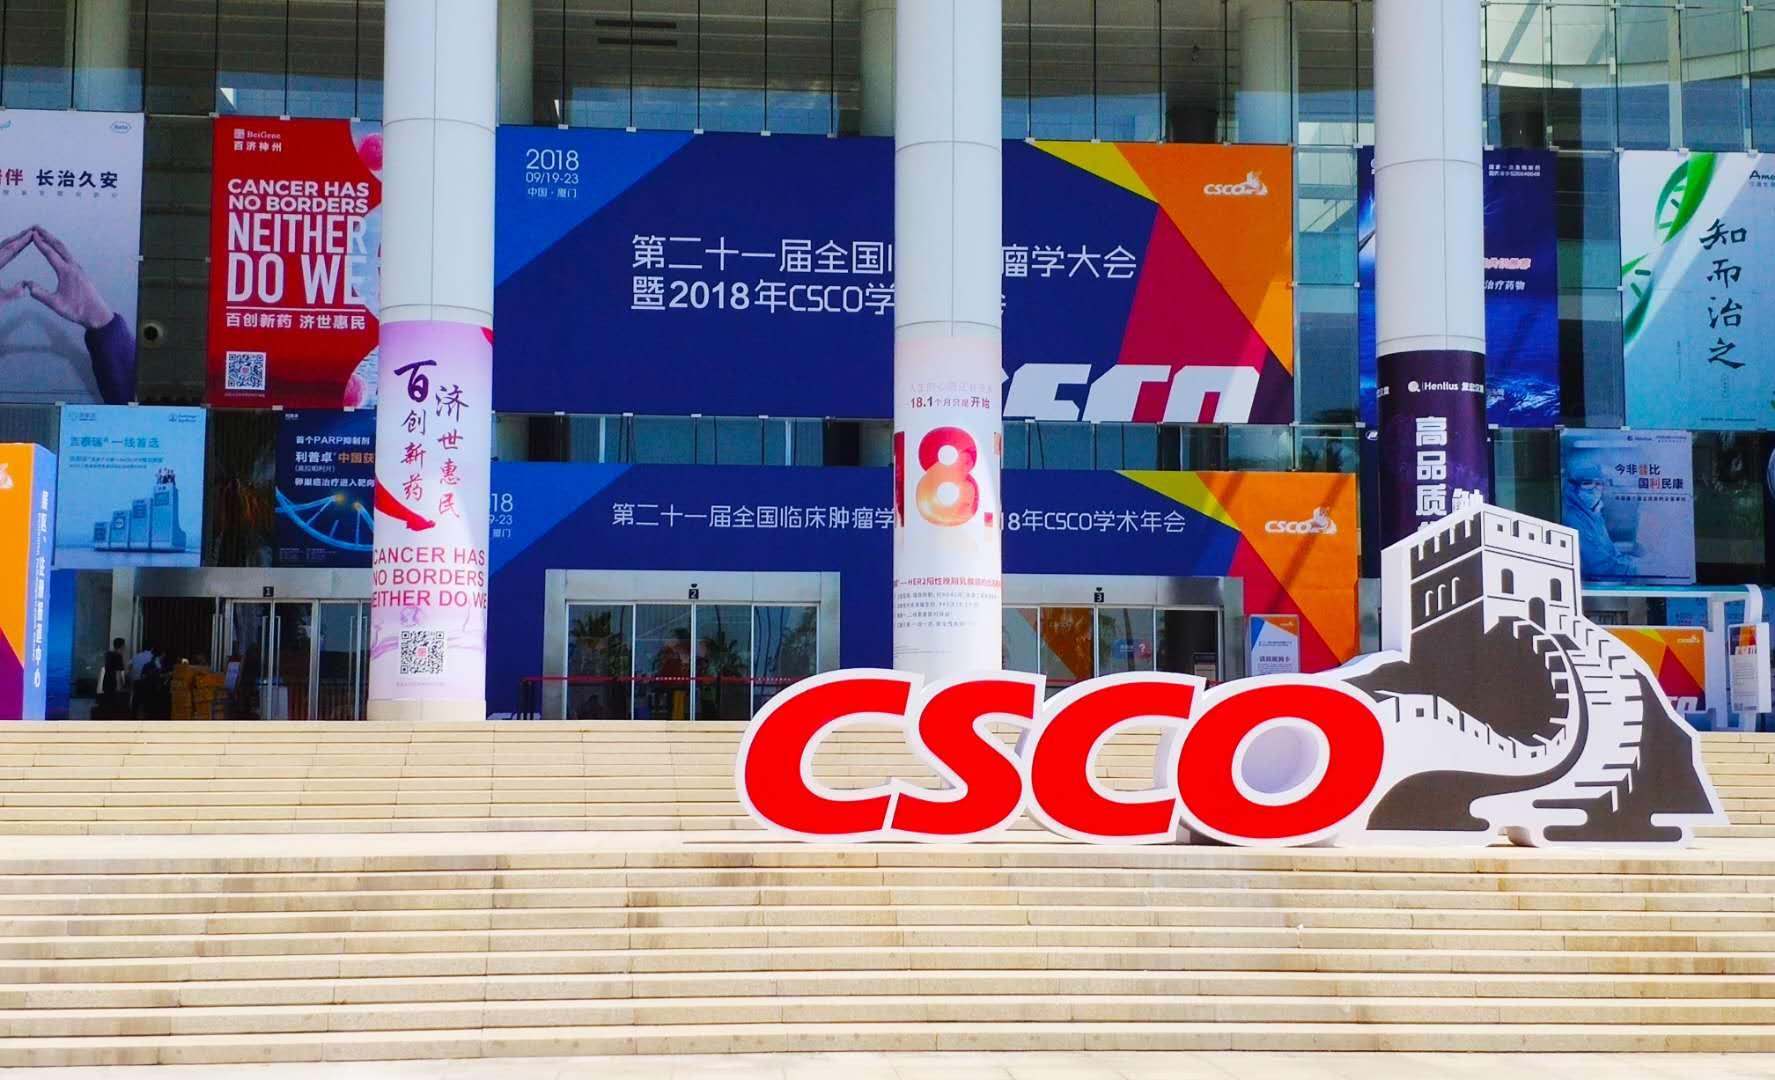 CSCO瞭望 | 8大诊疗指南更新要点,CSCO简报发布